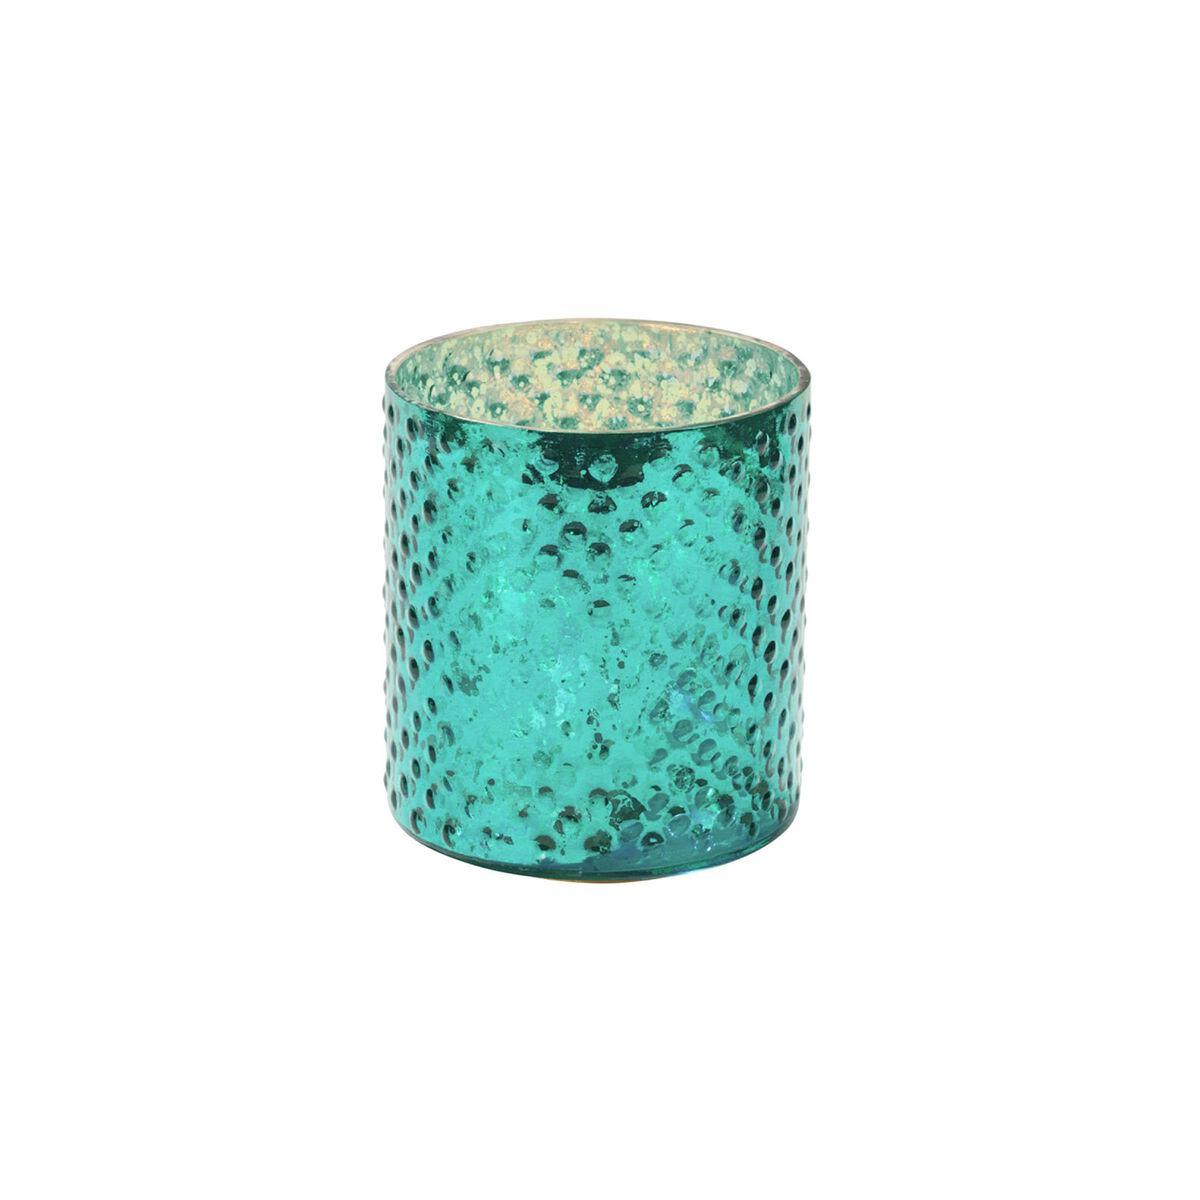 delight teelichthalter t rkis 7cm butlers. Black Bedroom Furniture Sets. Home Design Ideas